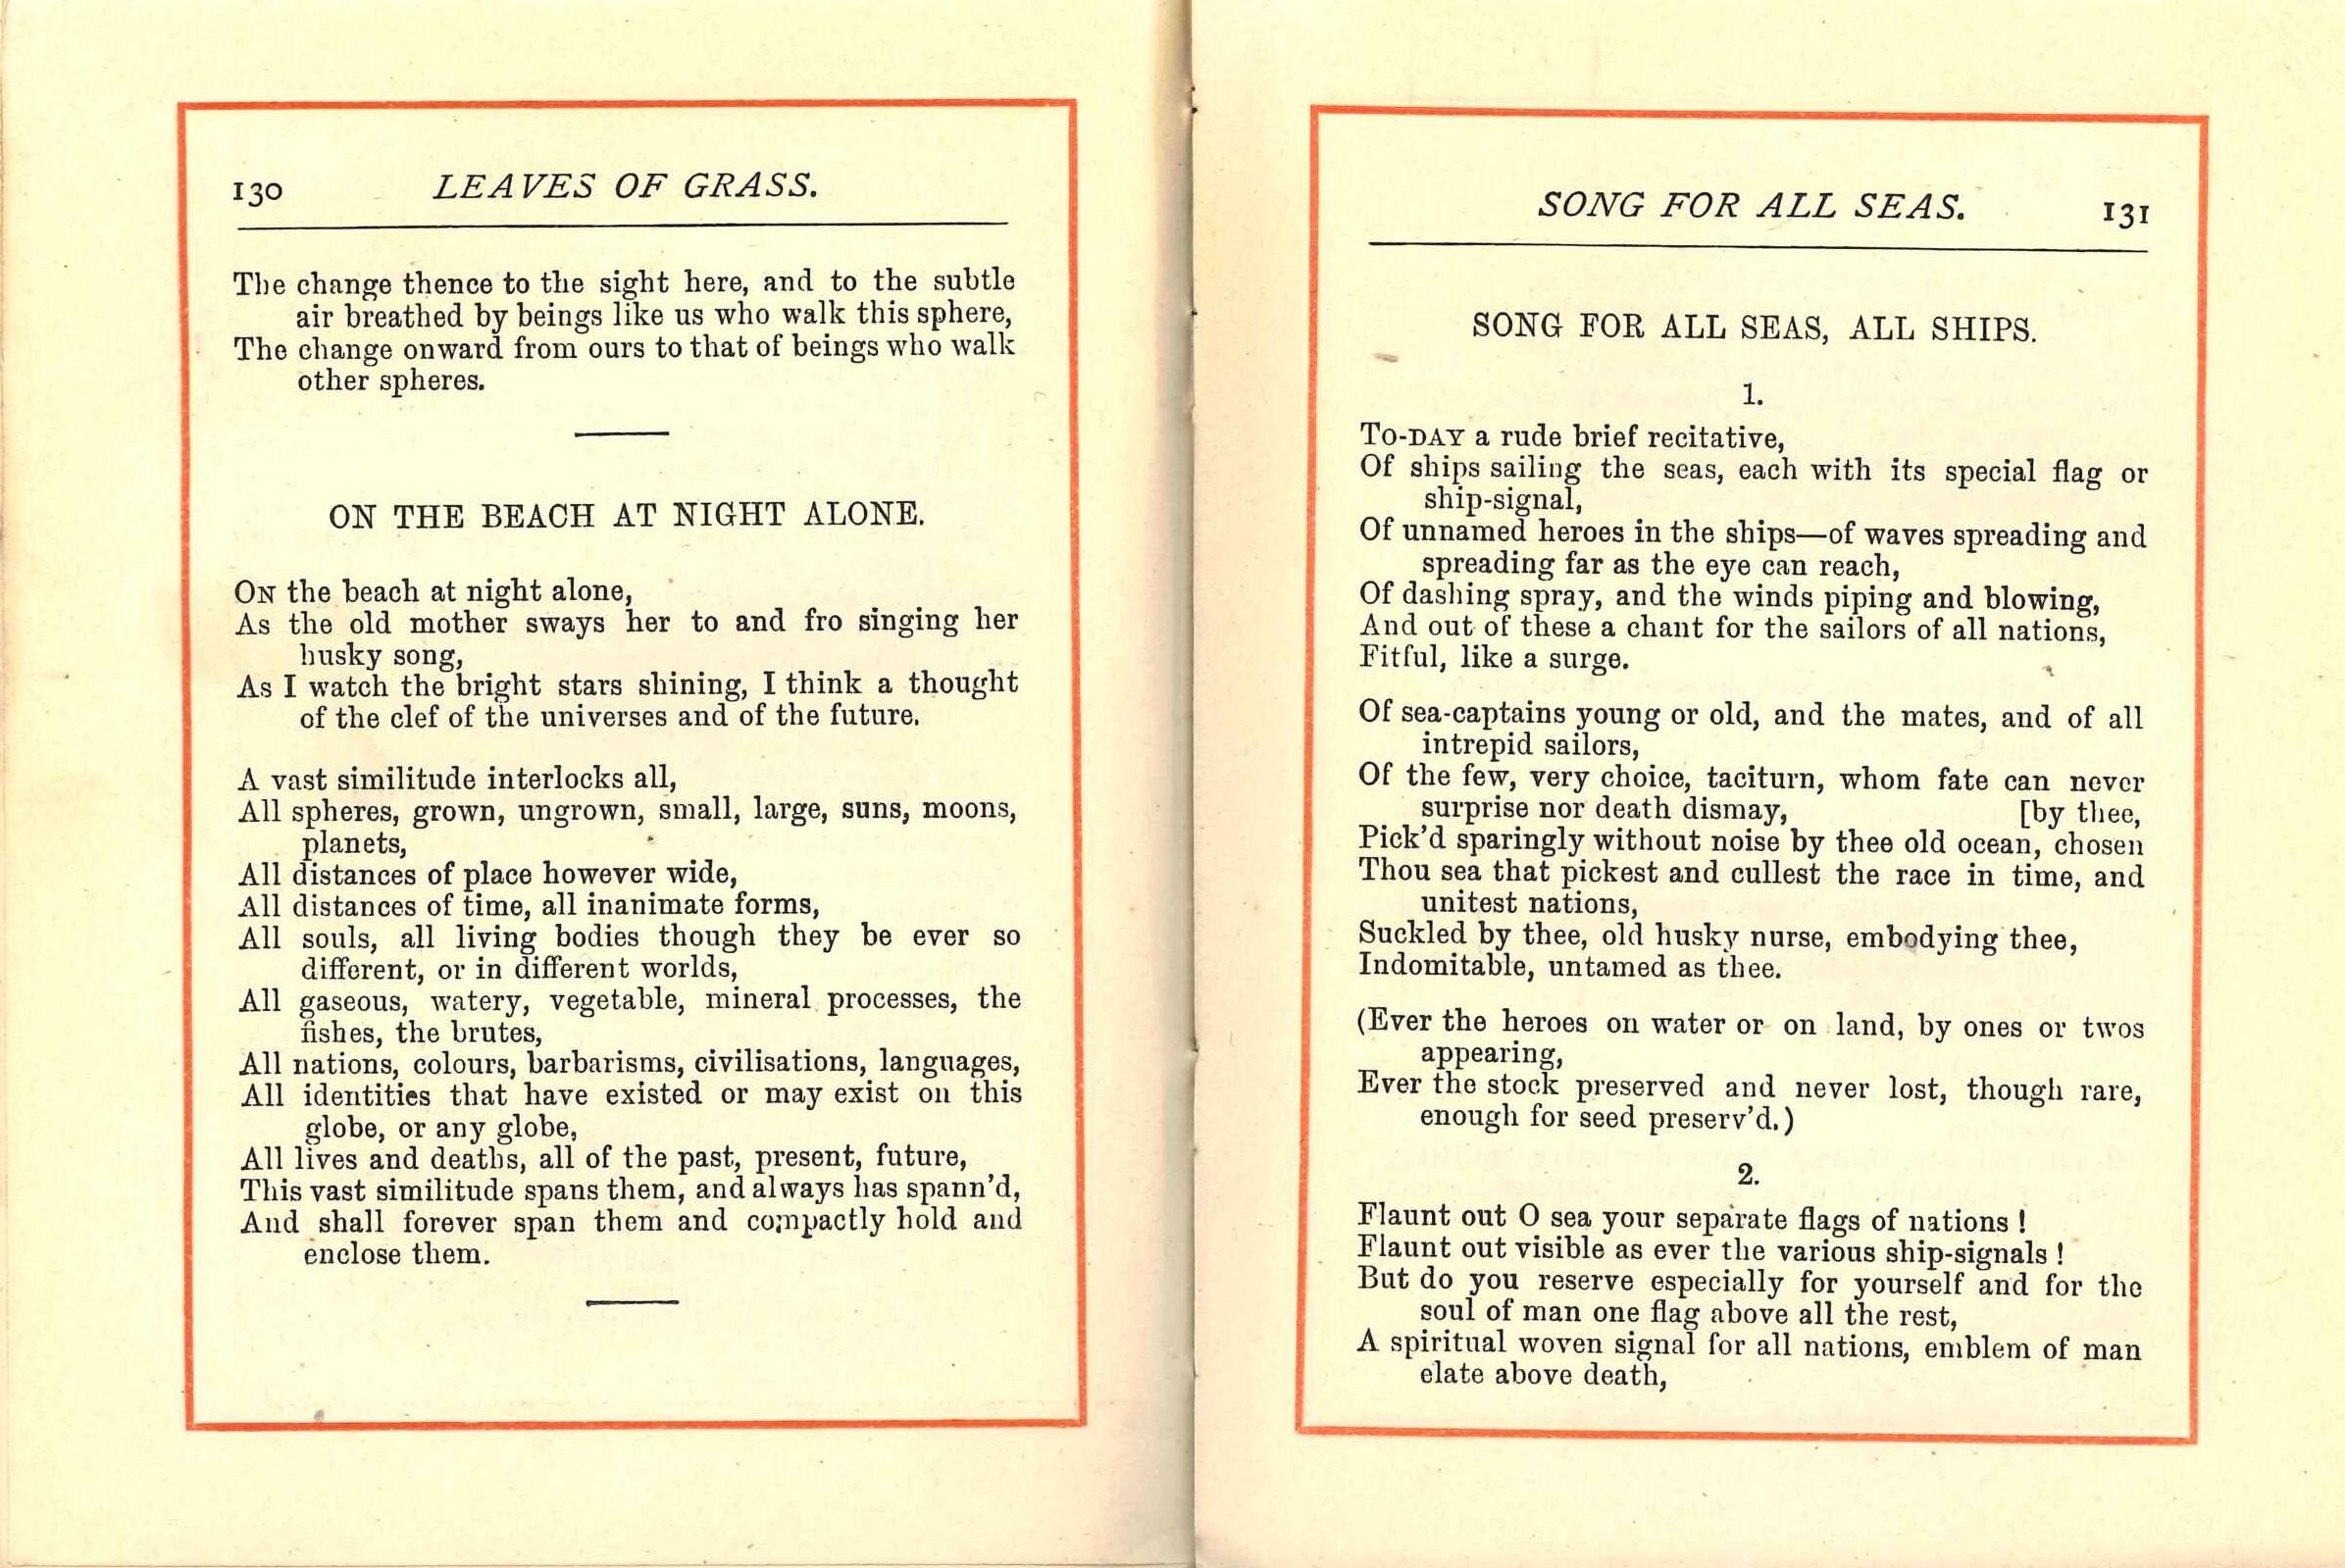 Walt Whitman. Leaves of Grass: The Poems of Walt Whitman. London; Newcastle: Walter Scott, 1886.